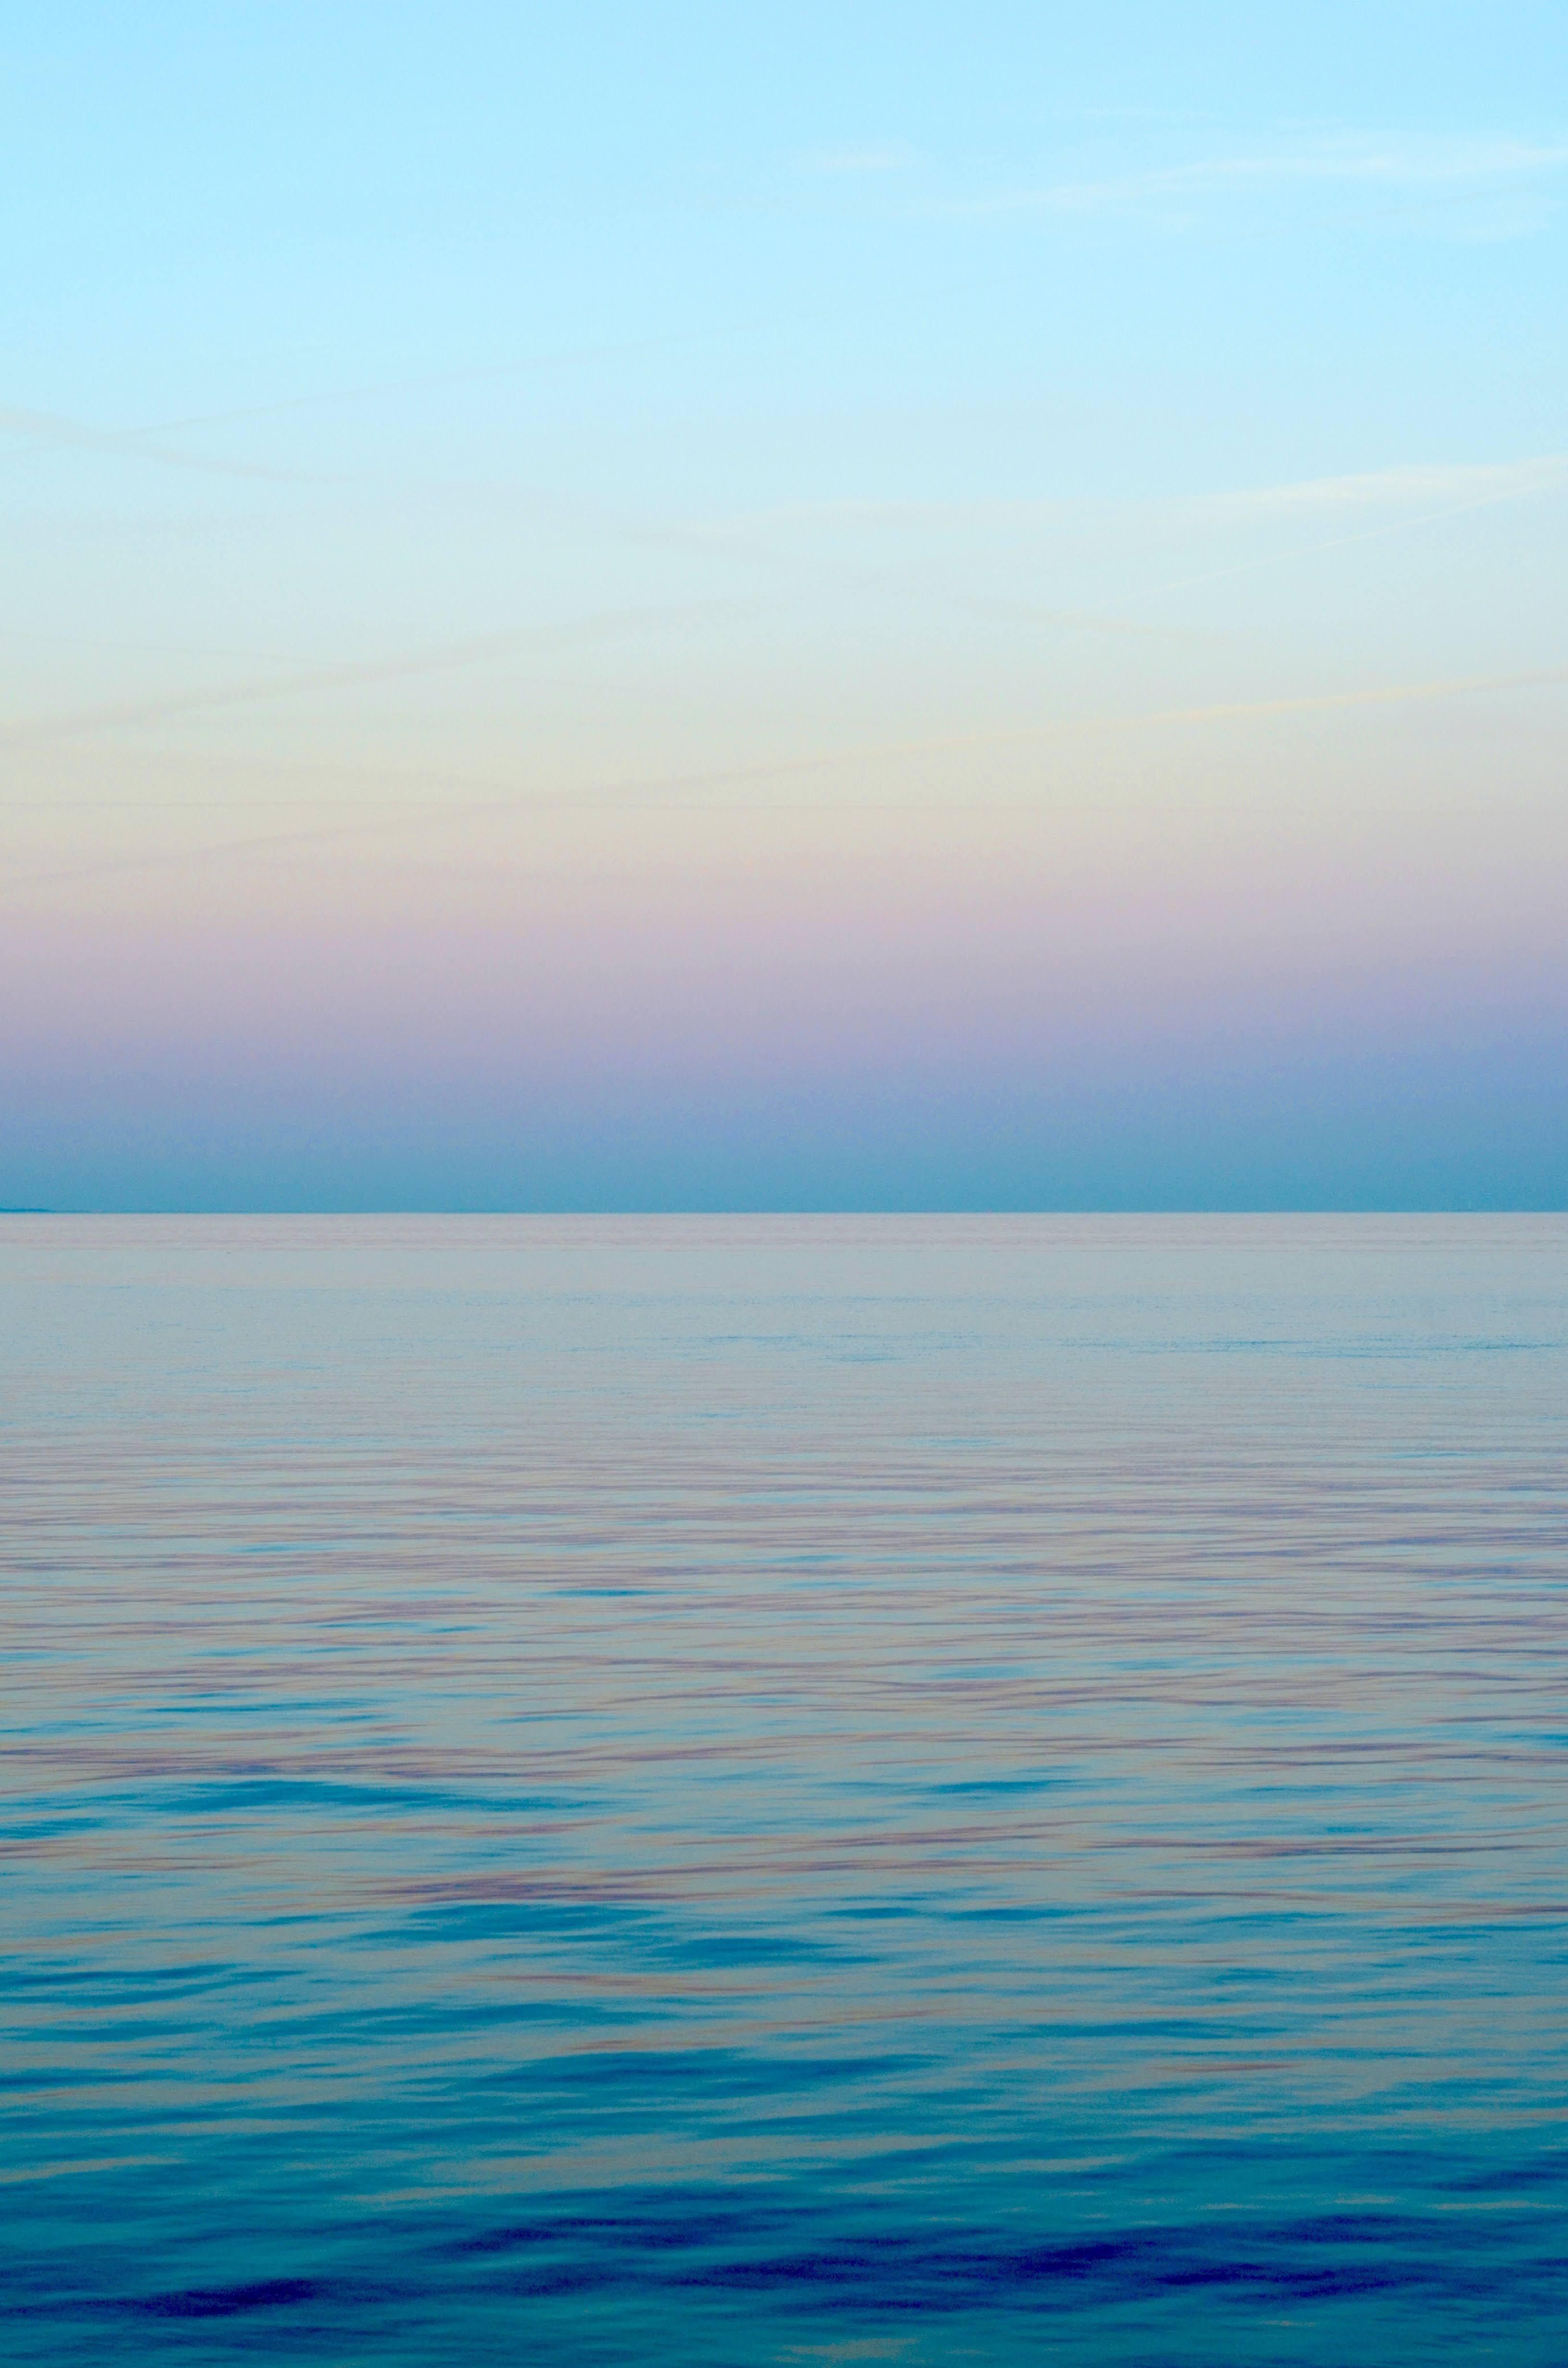 Twilight hour from Copenhagen's Strandvejen | Photo by Jan Tinneberg via Unsplash